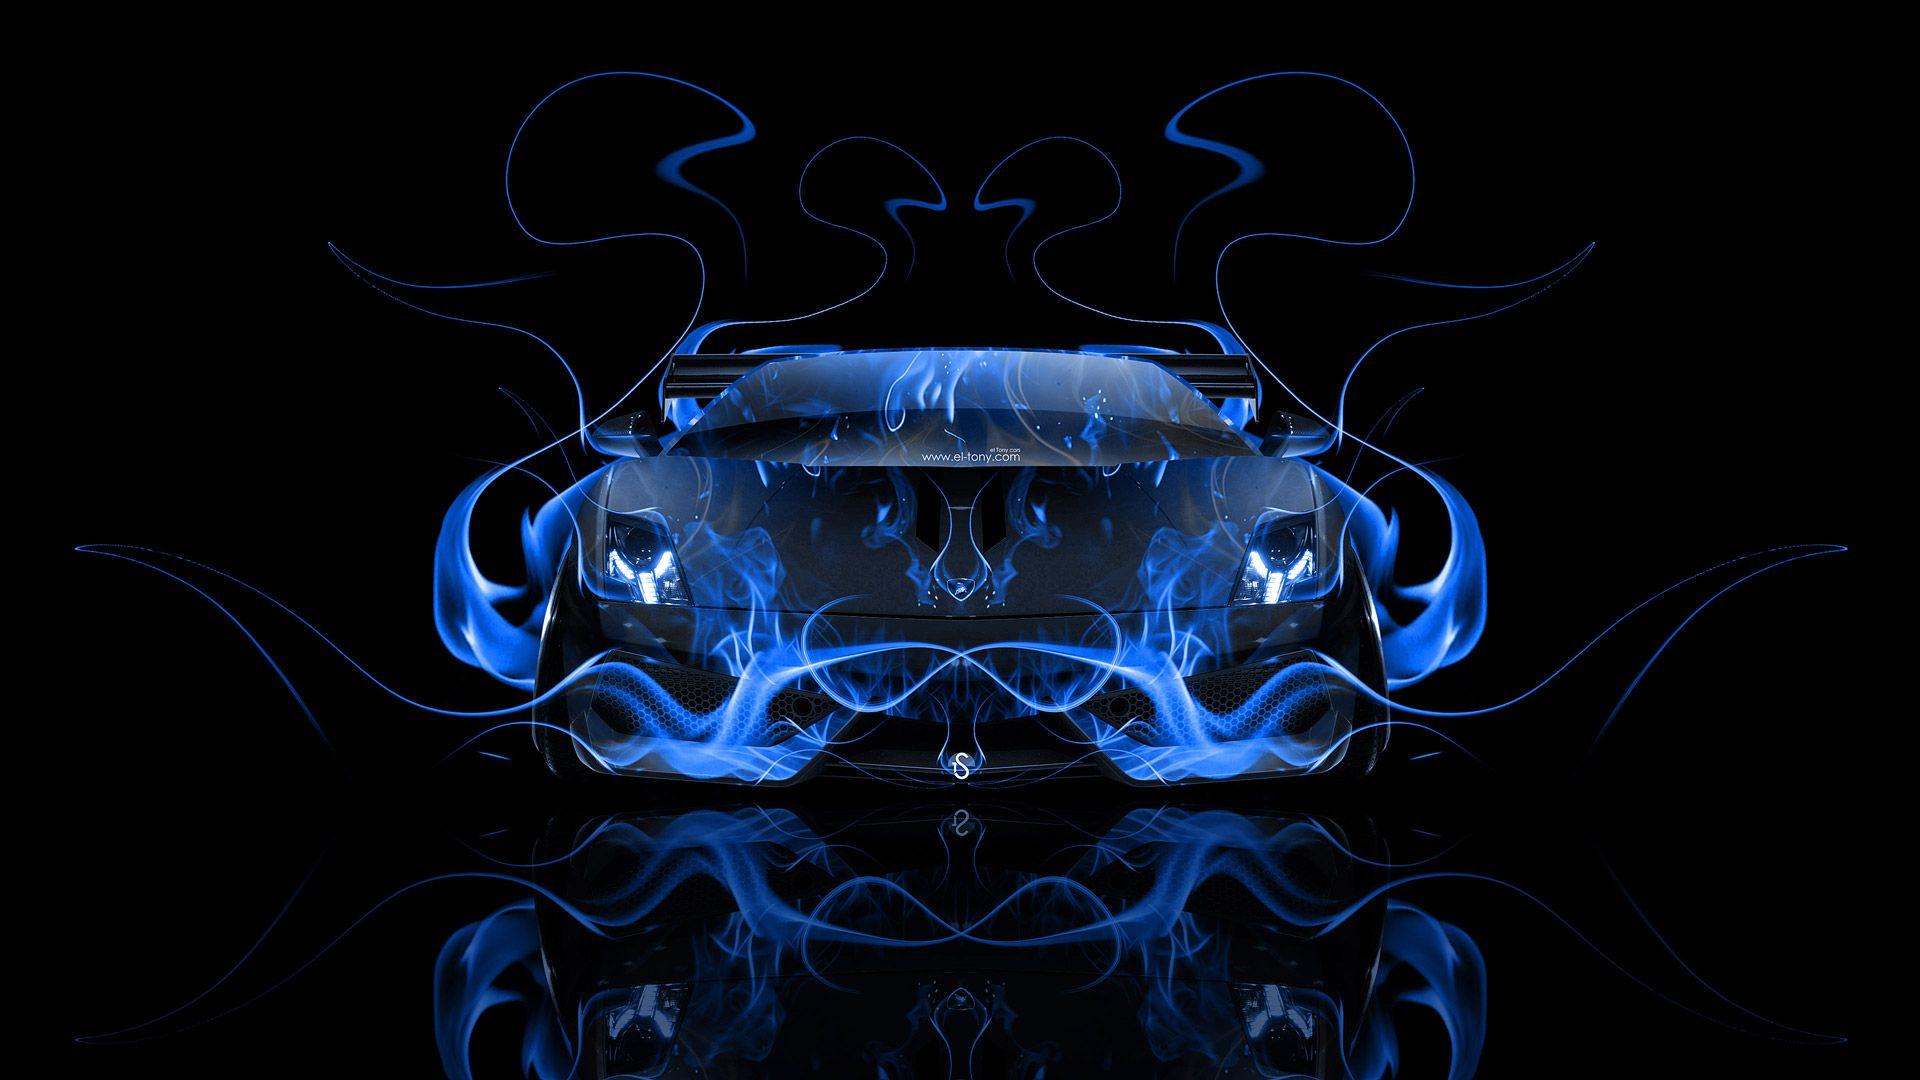 Nice Lamborghini Gallardo Back Abstract Car Design By Tony Kokhan Wallpapers) U2013  HD Desktop Wallpapers